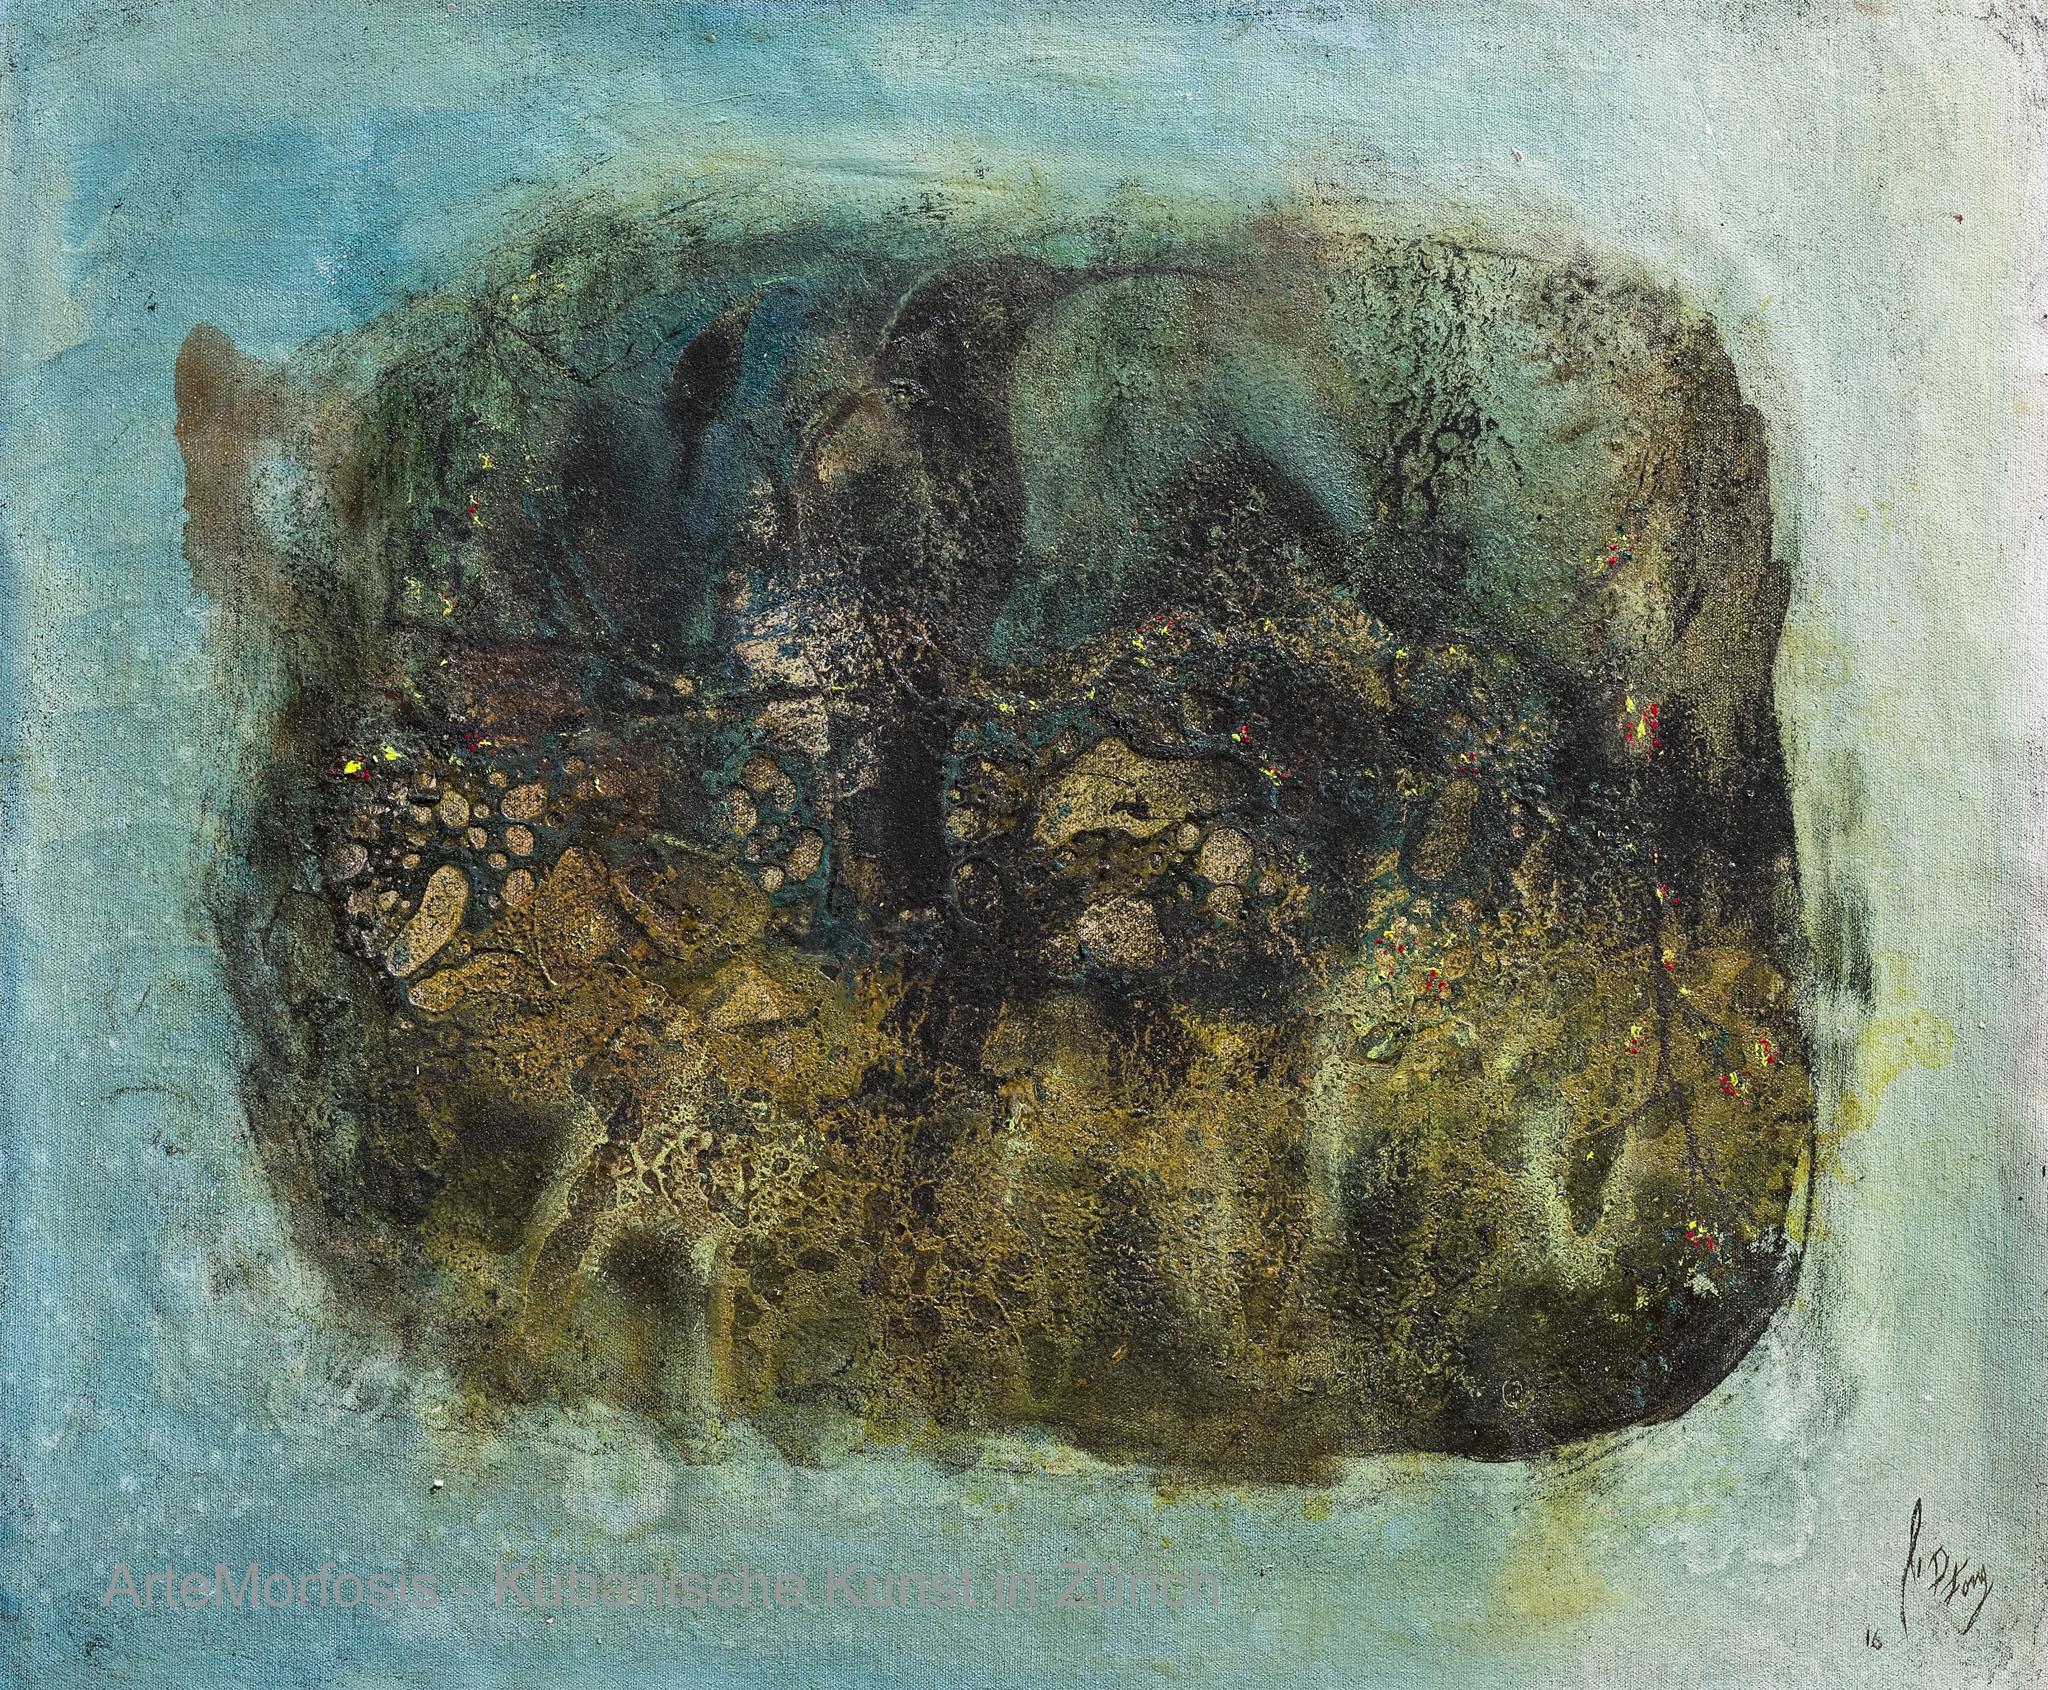 Li D Fong: Viajeros / Travellers - mixed on Canvas - 2016 - 59 x 70 cm